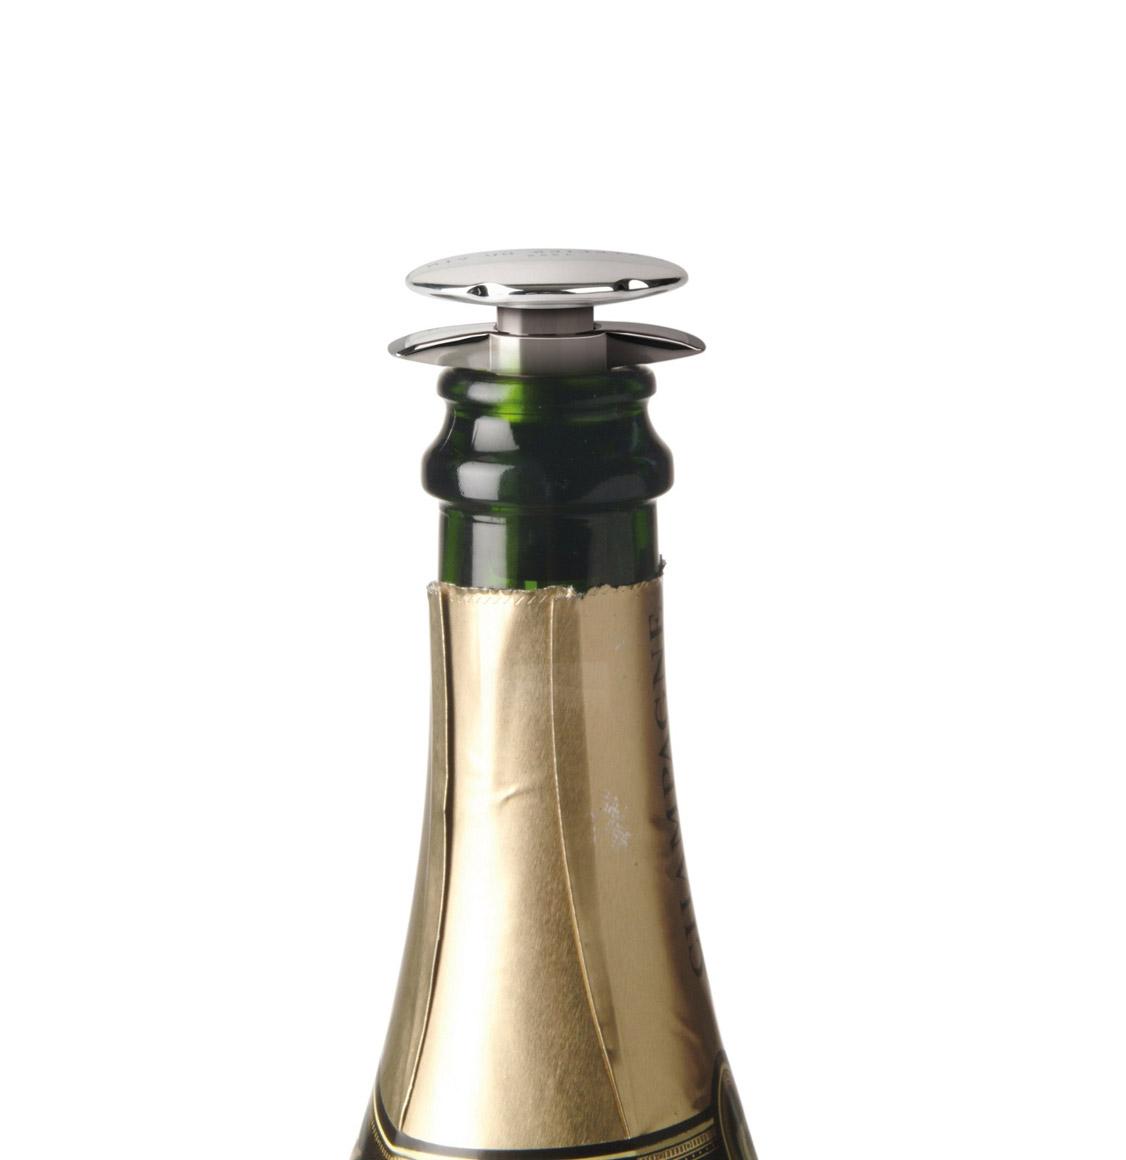 L' Atelier Du Vin Model 54 Universal Champagne Stopper